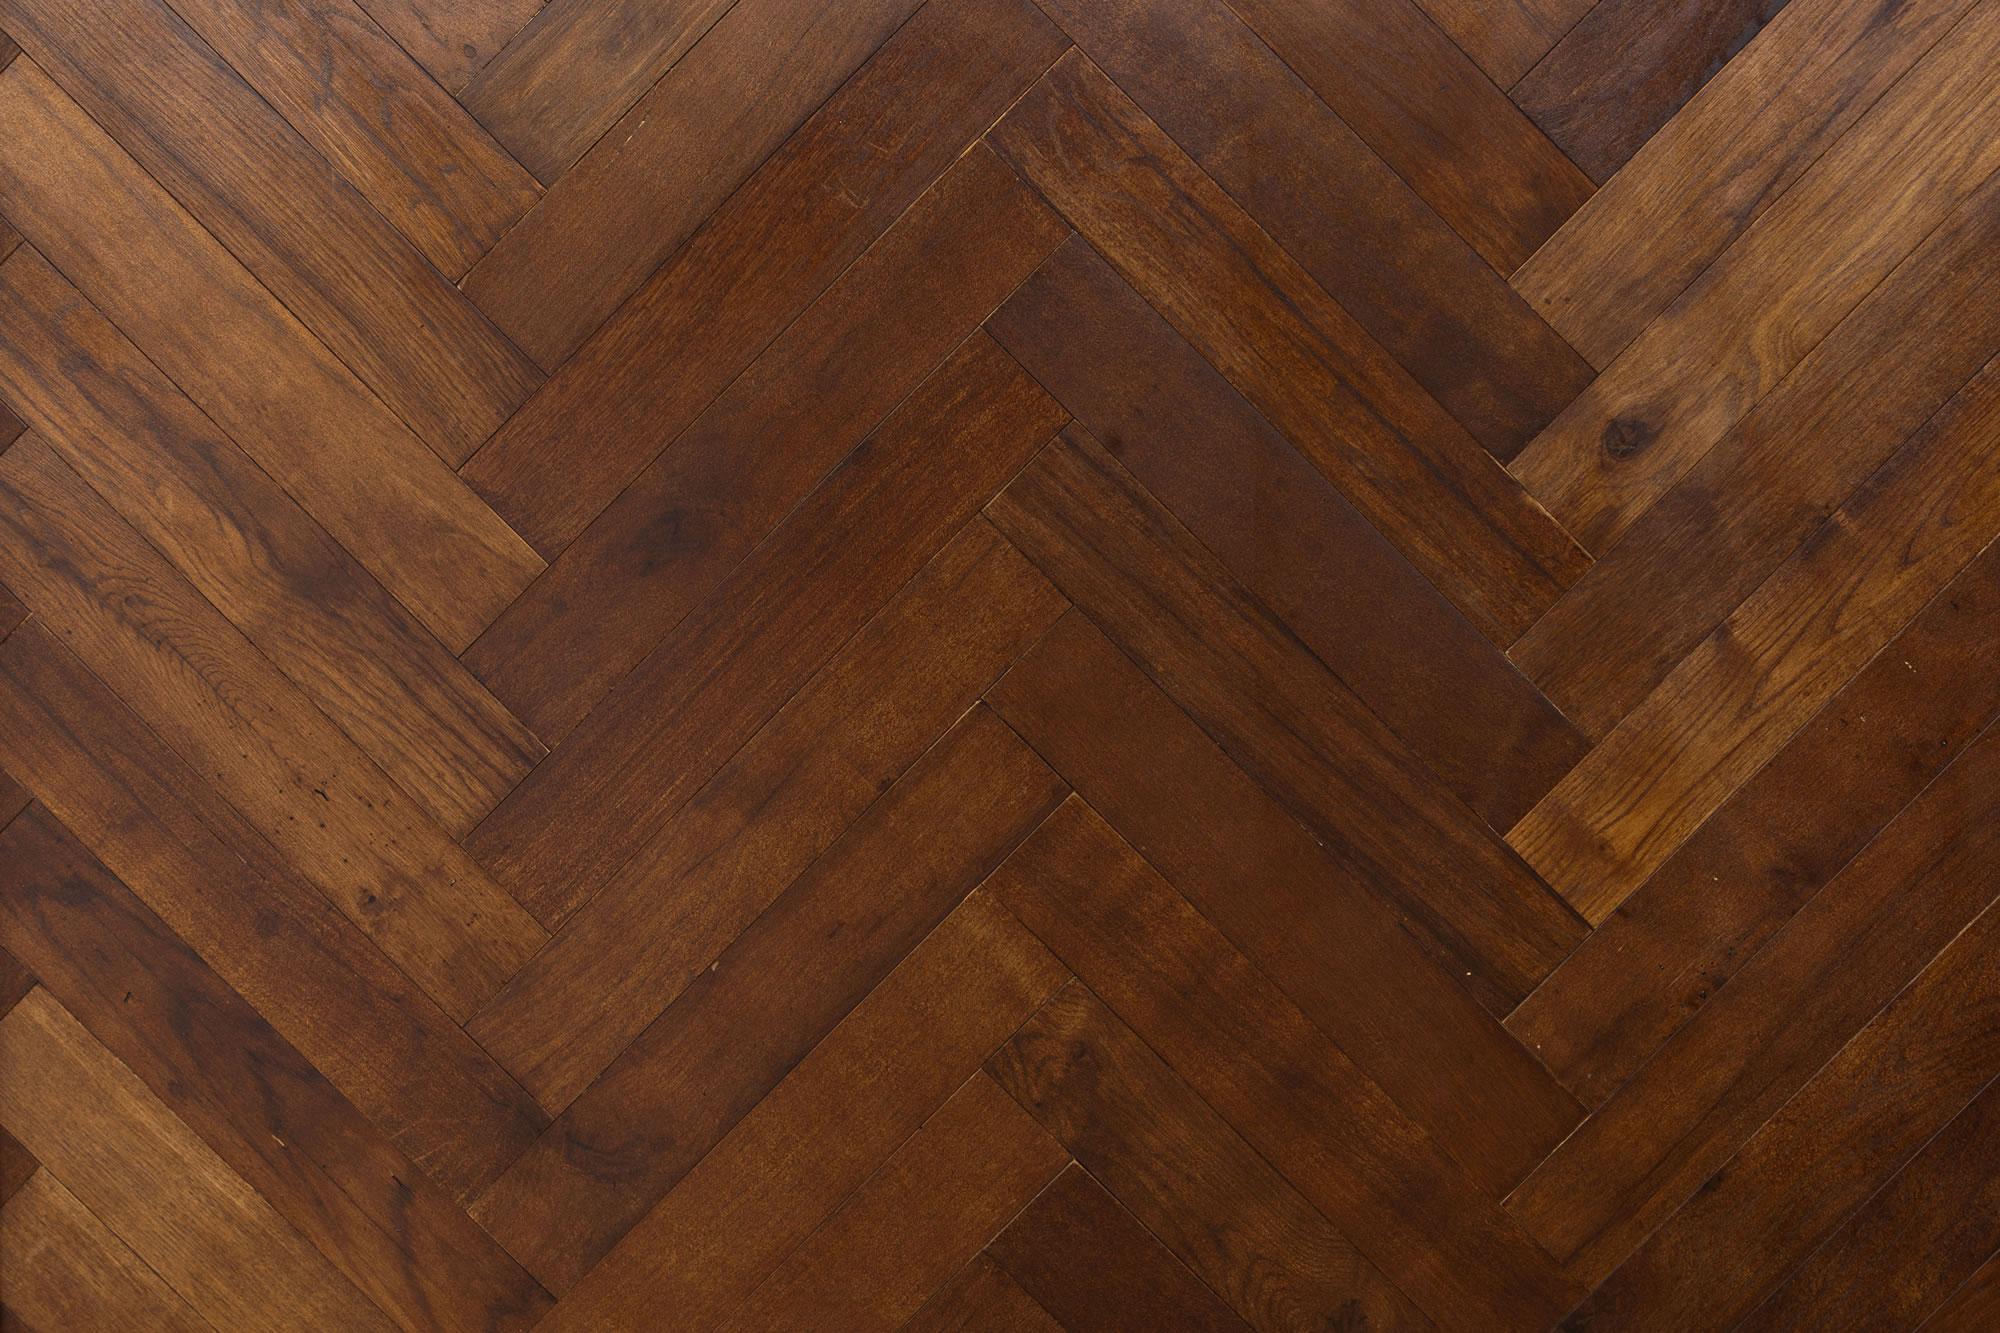 Reclaimed Brown Oak Herringbone Element7